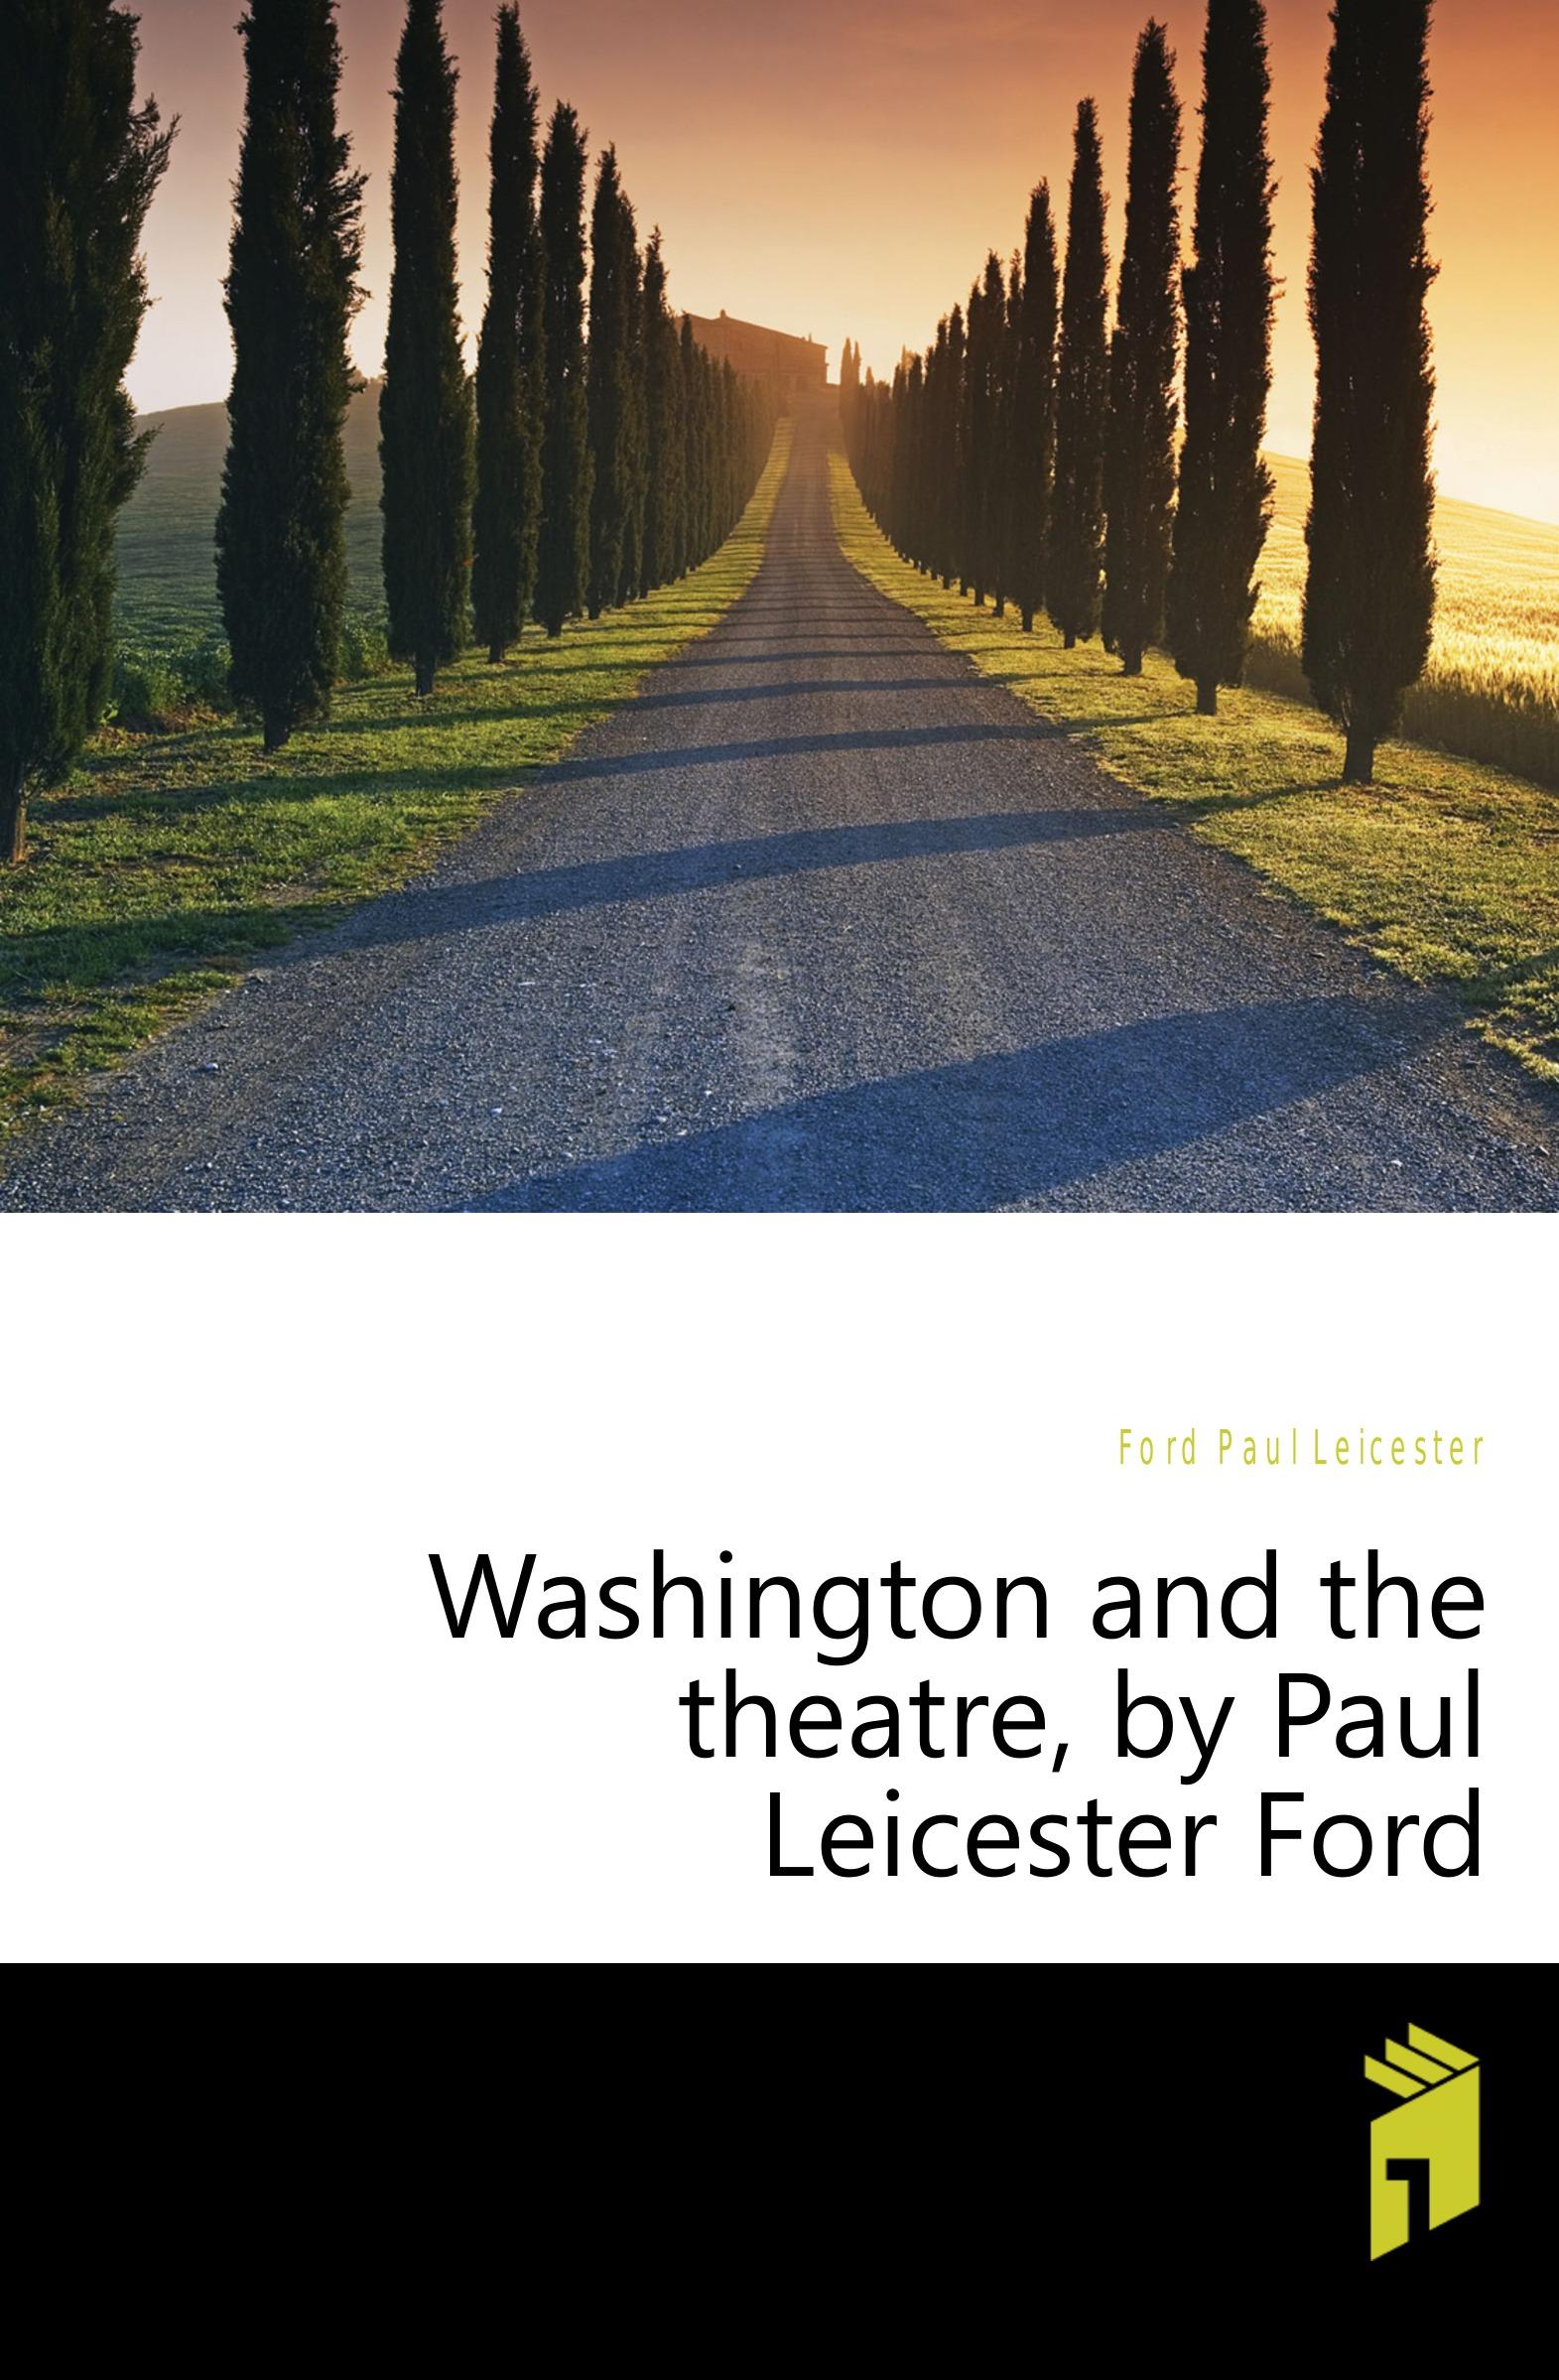 цена на Paul Leicester Ford Washington and the theatre, by Paul Leicester Ford